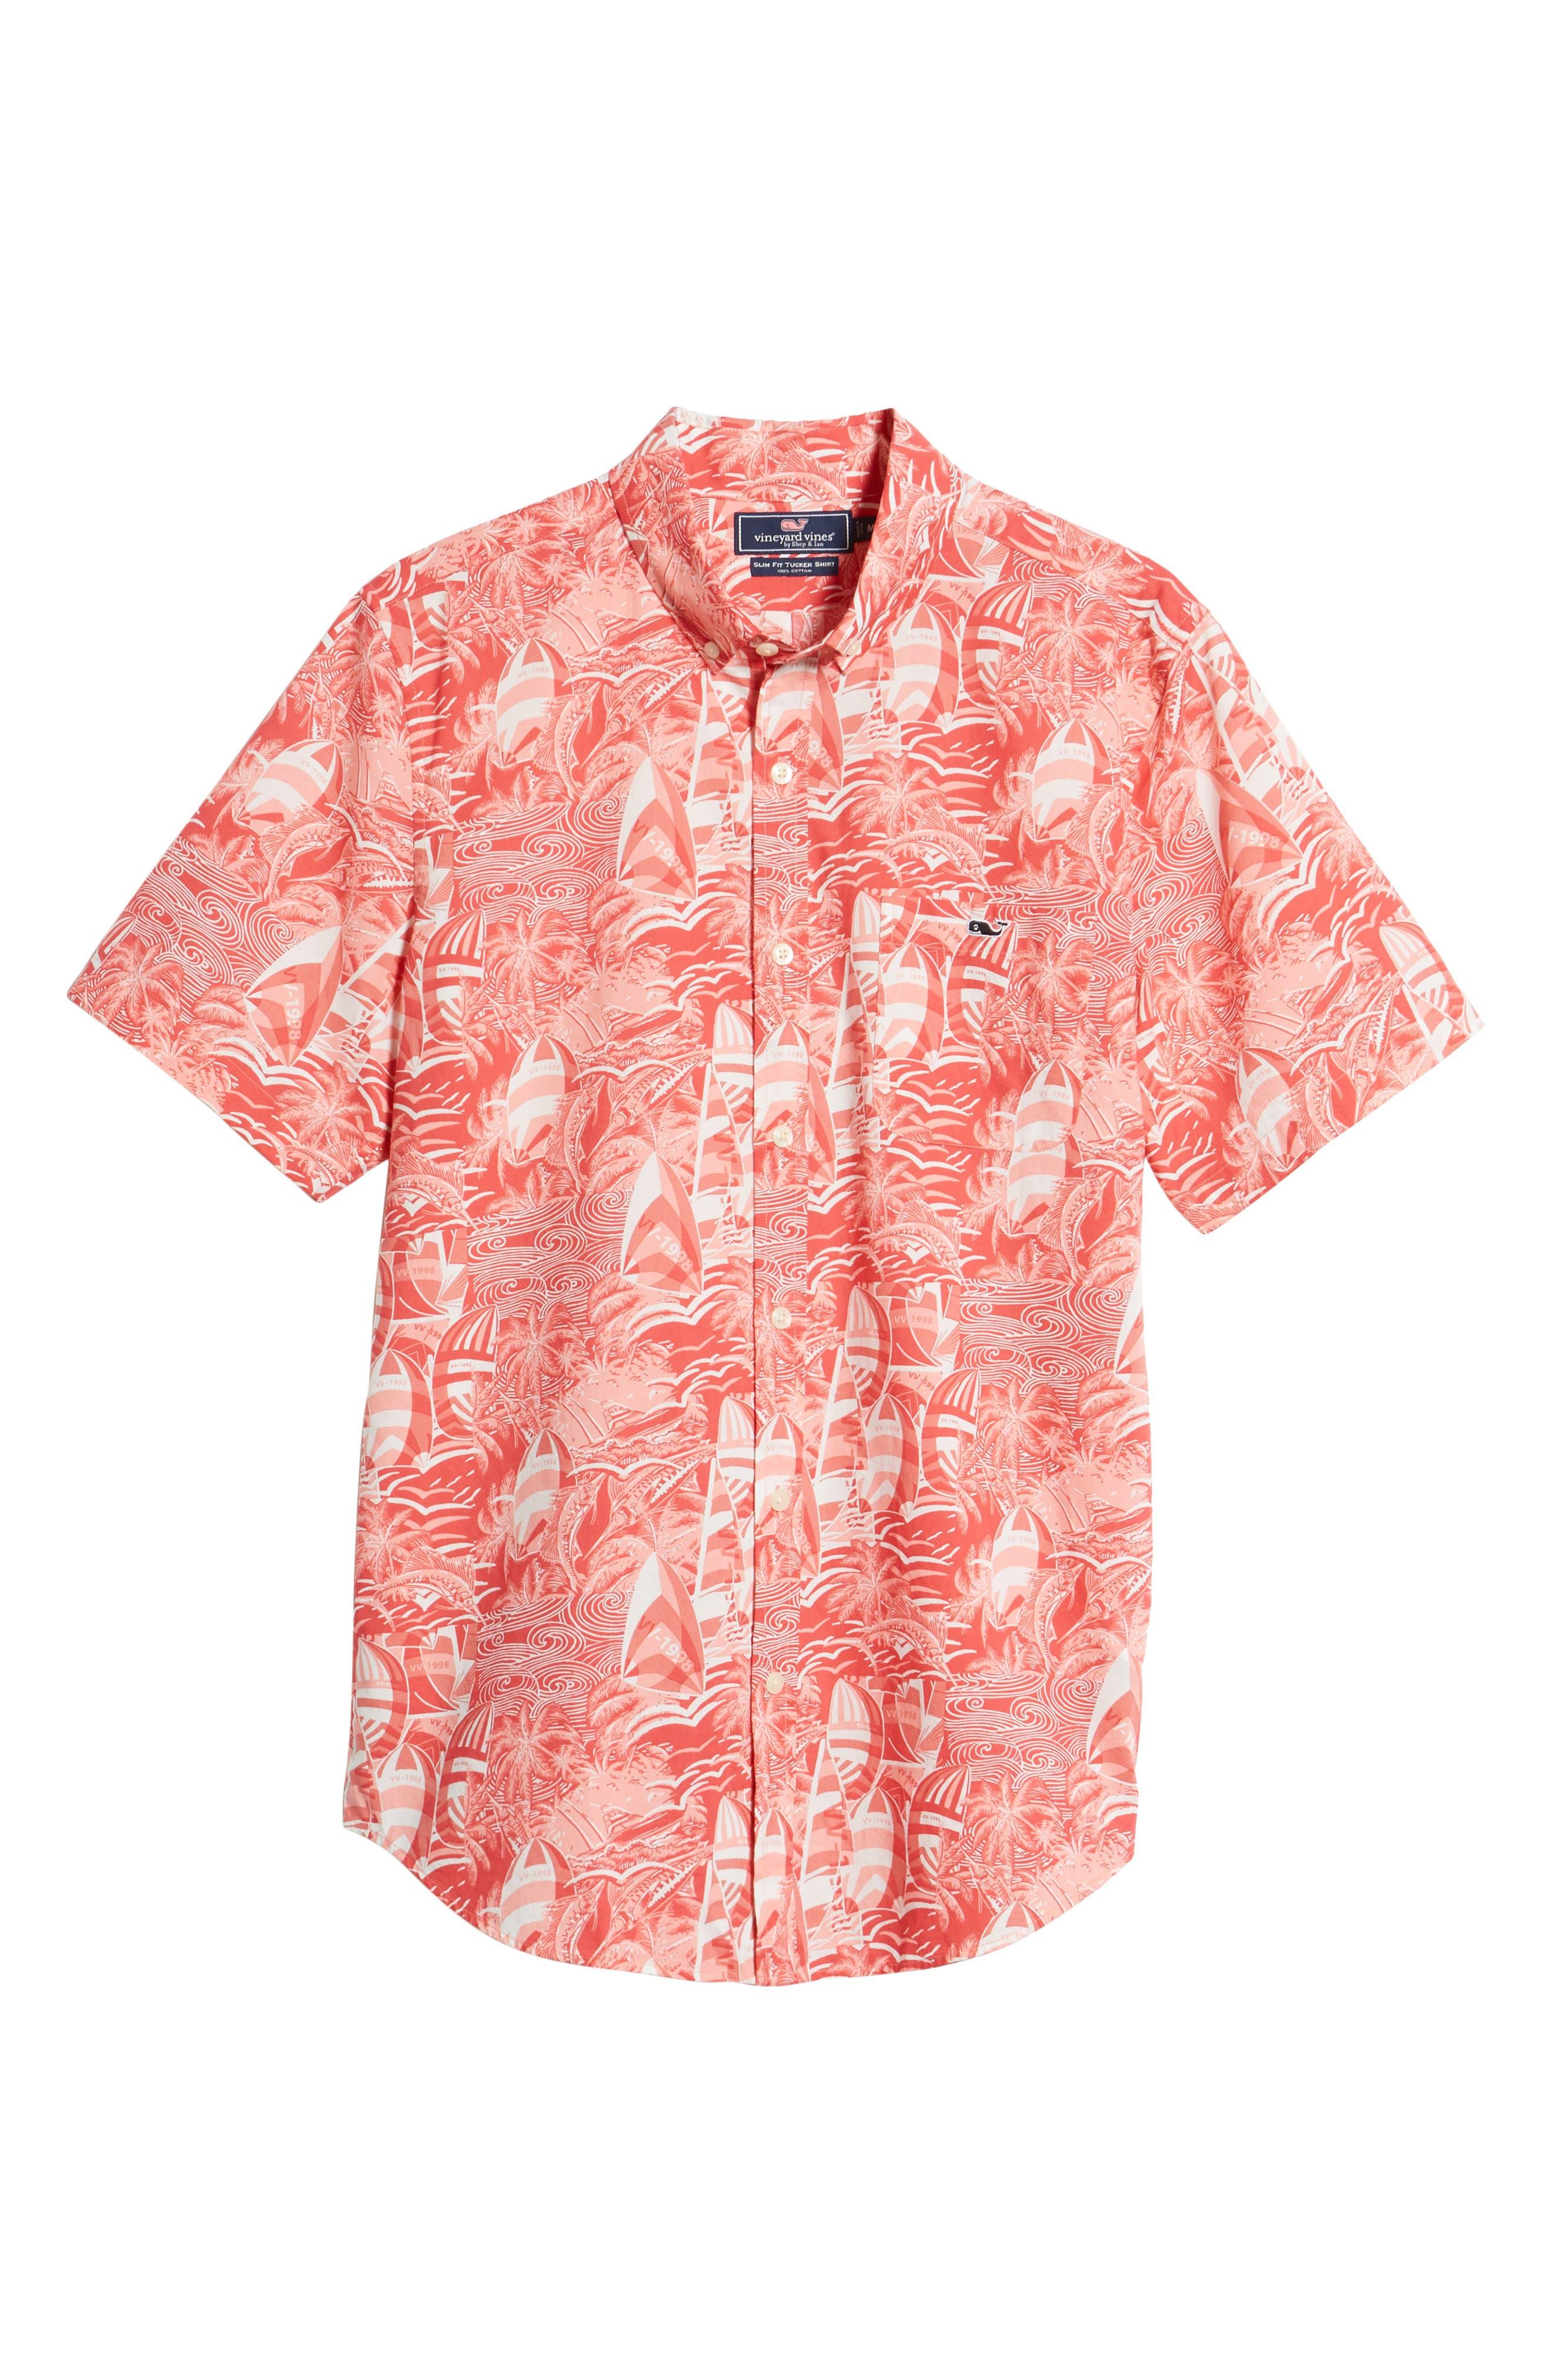 At Sea Tucker Slim Fit Sport Shirt,                             Alternate thumbnail 6, color,                             Sailors Red